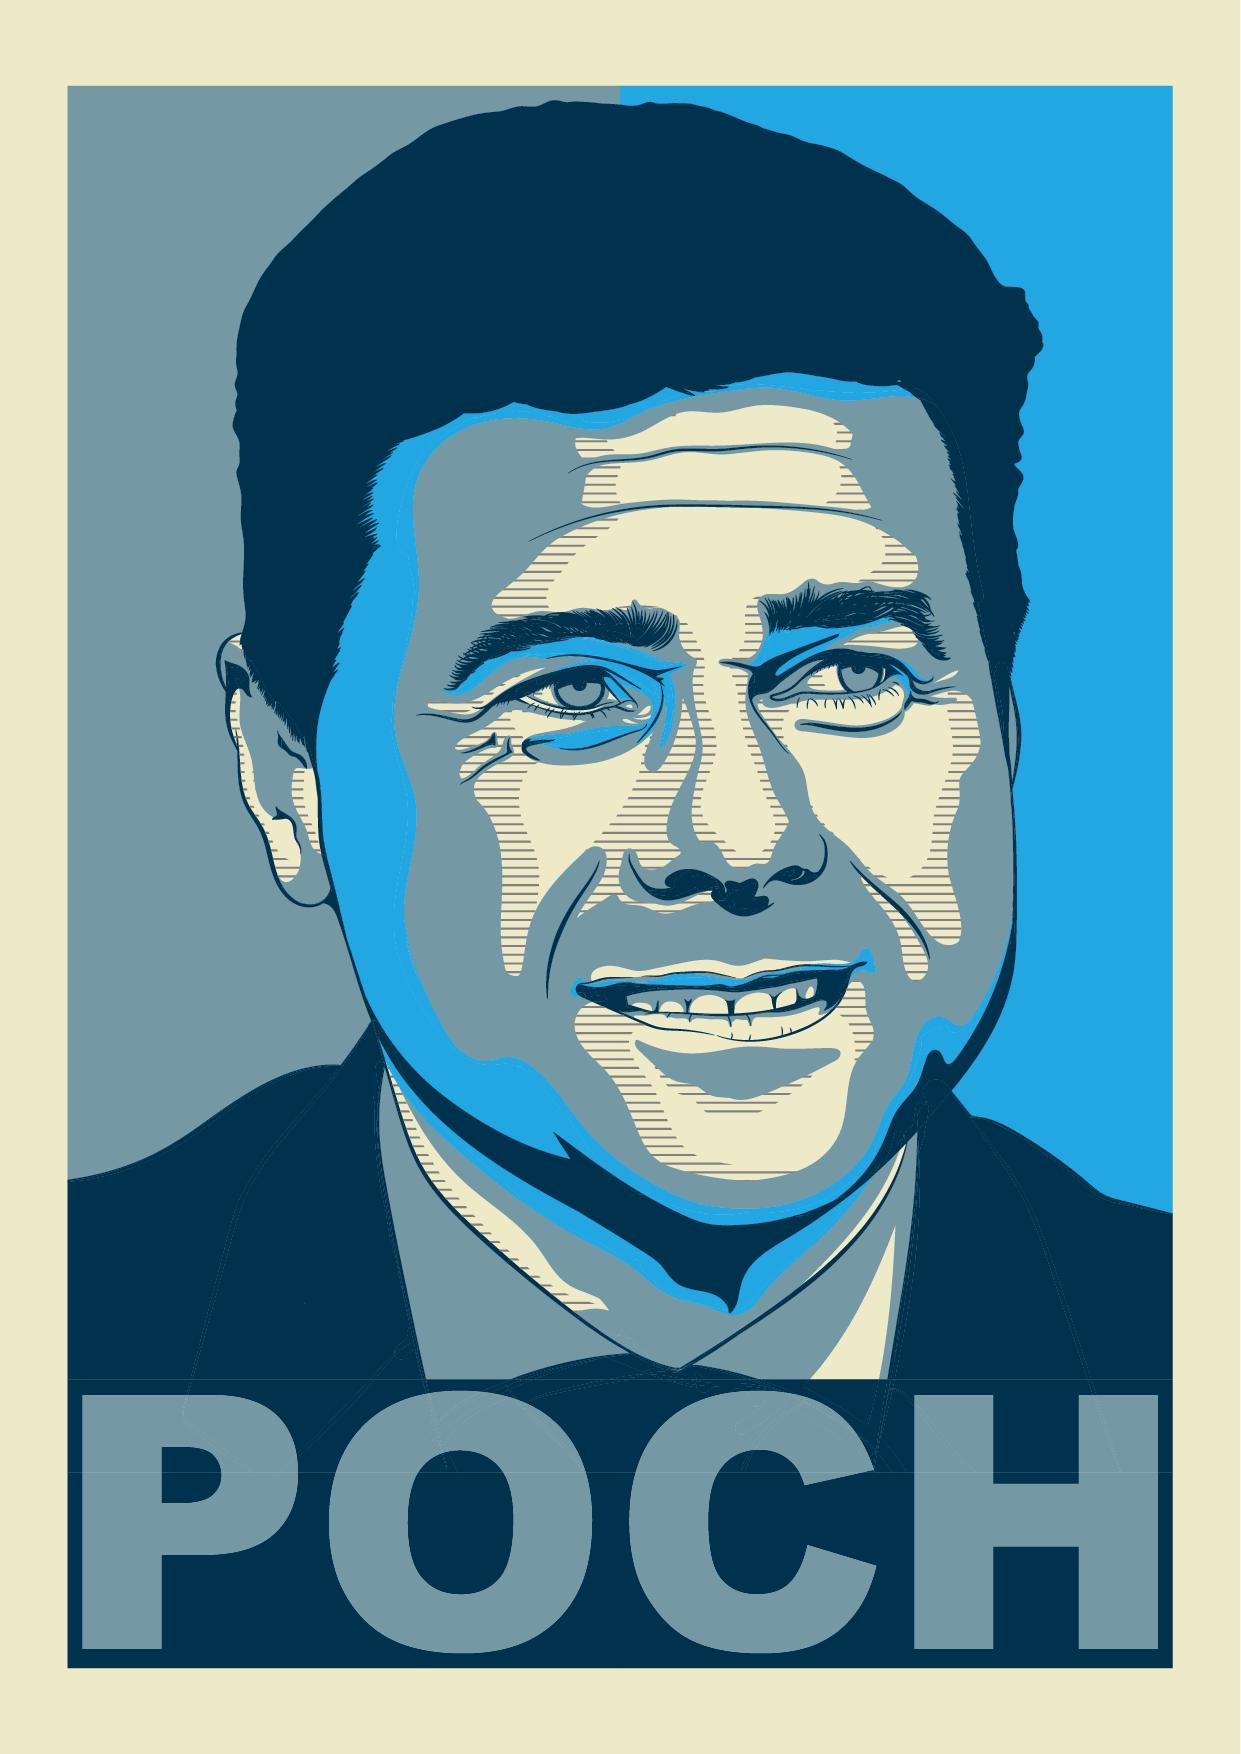 Vote-Potch-t-shirt-tottenhsm-01.png